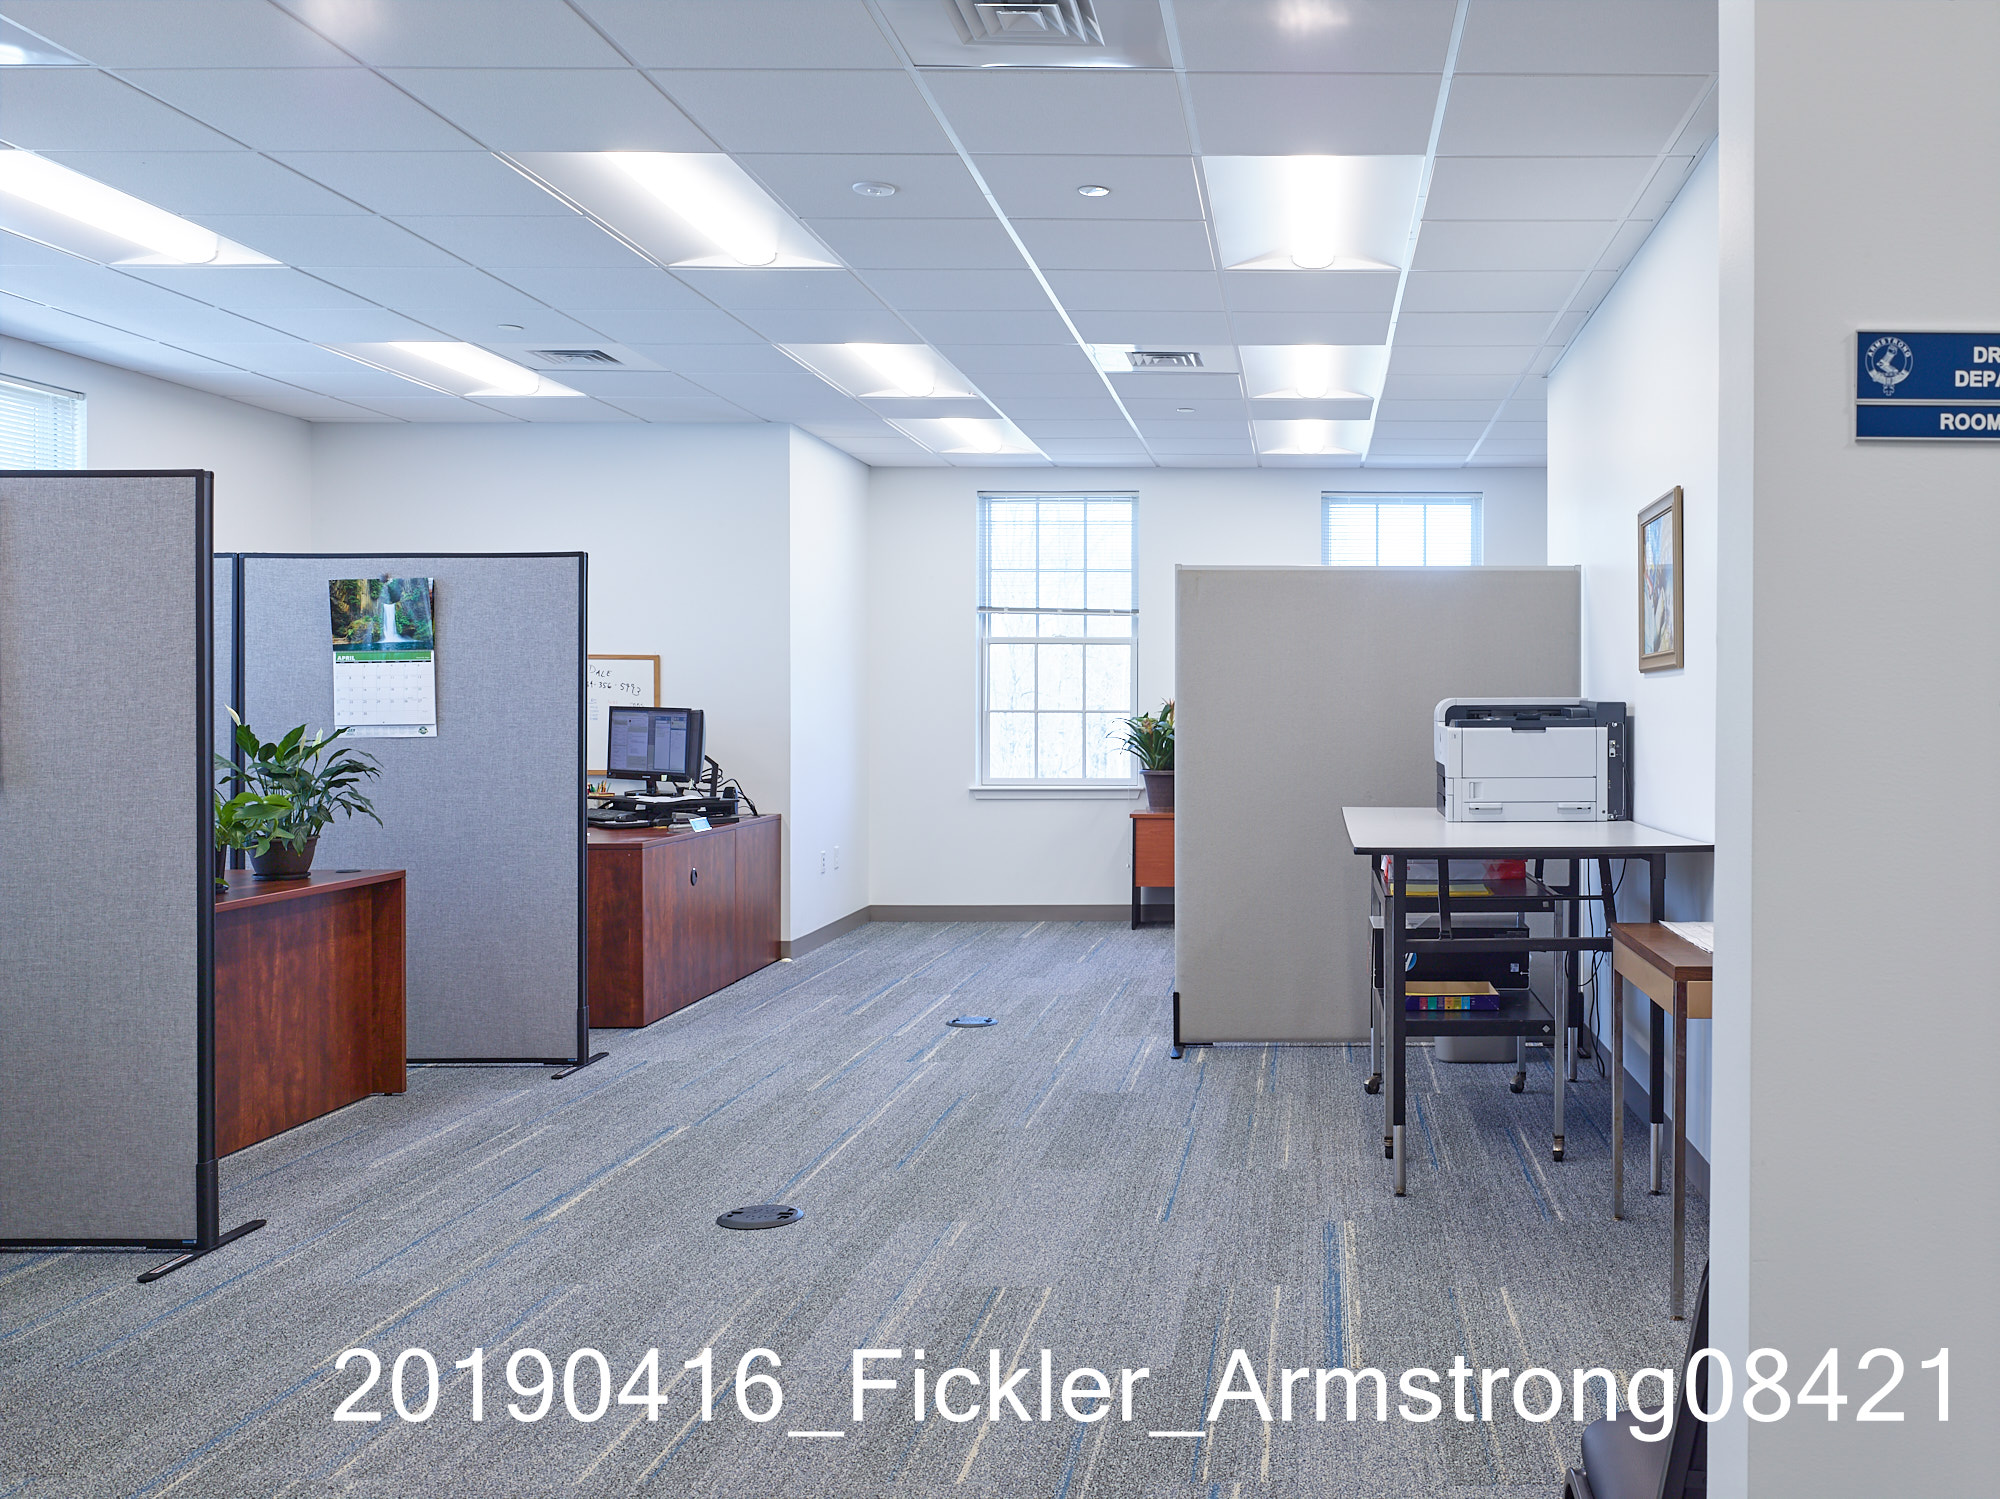 20190416_Fickler_Armstrong08421.jpg